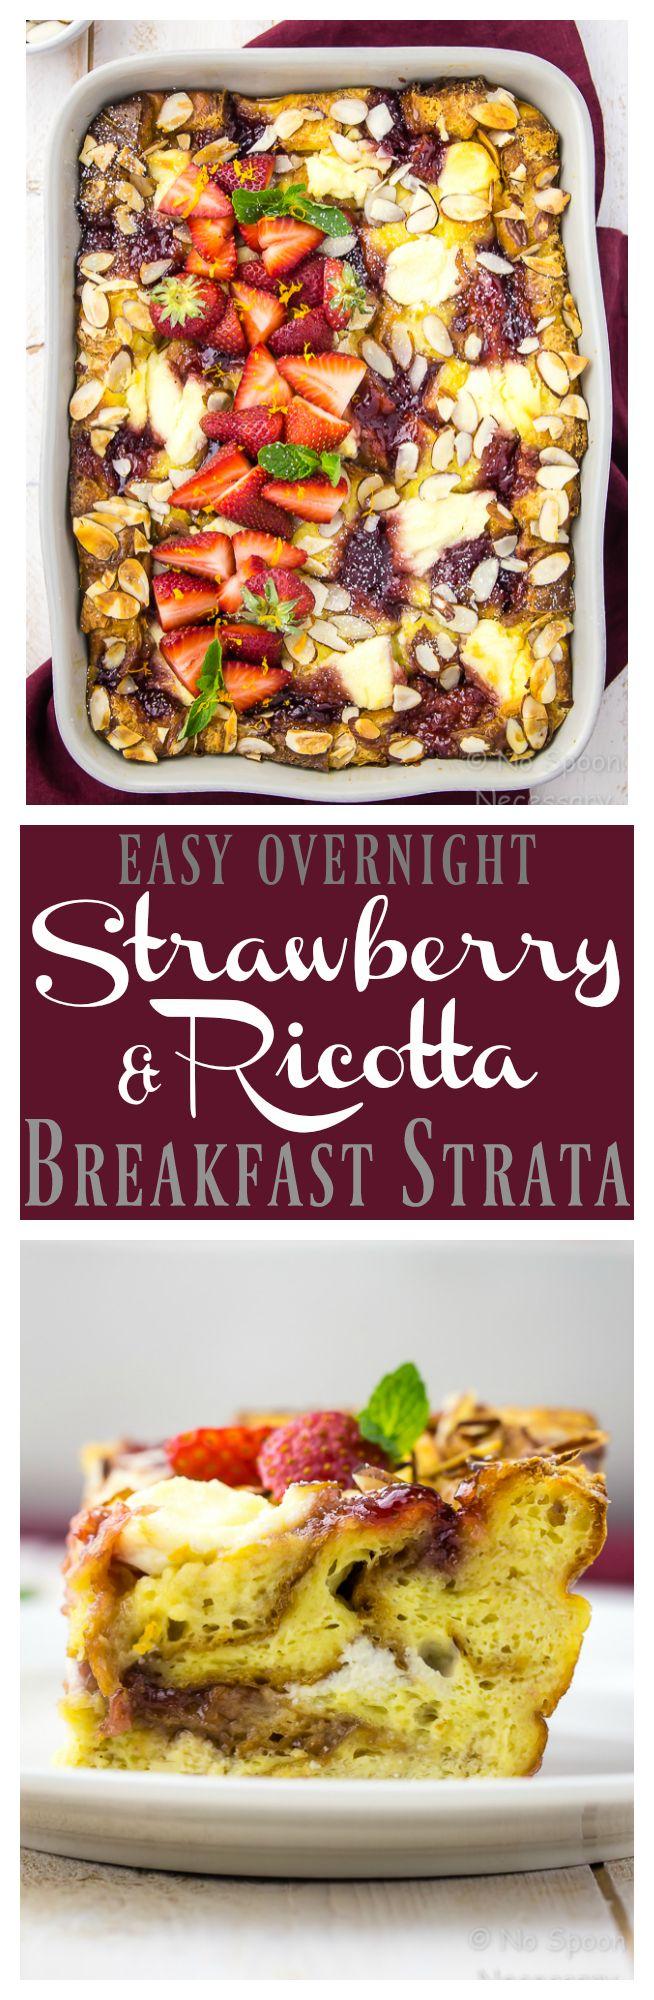 Easy Overnight Strawberry & Ricotta Breakfast Strata. [ad] #SayItWithHomemade #BonneMaman @BonneMamanPreserves